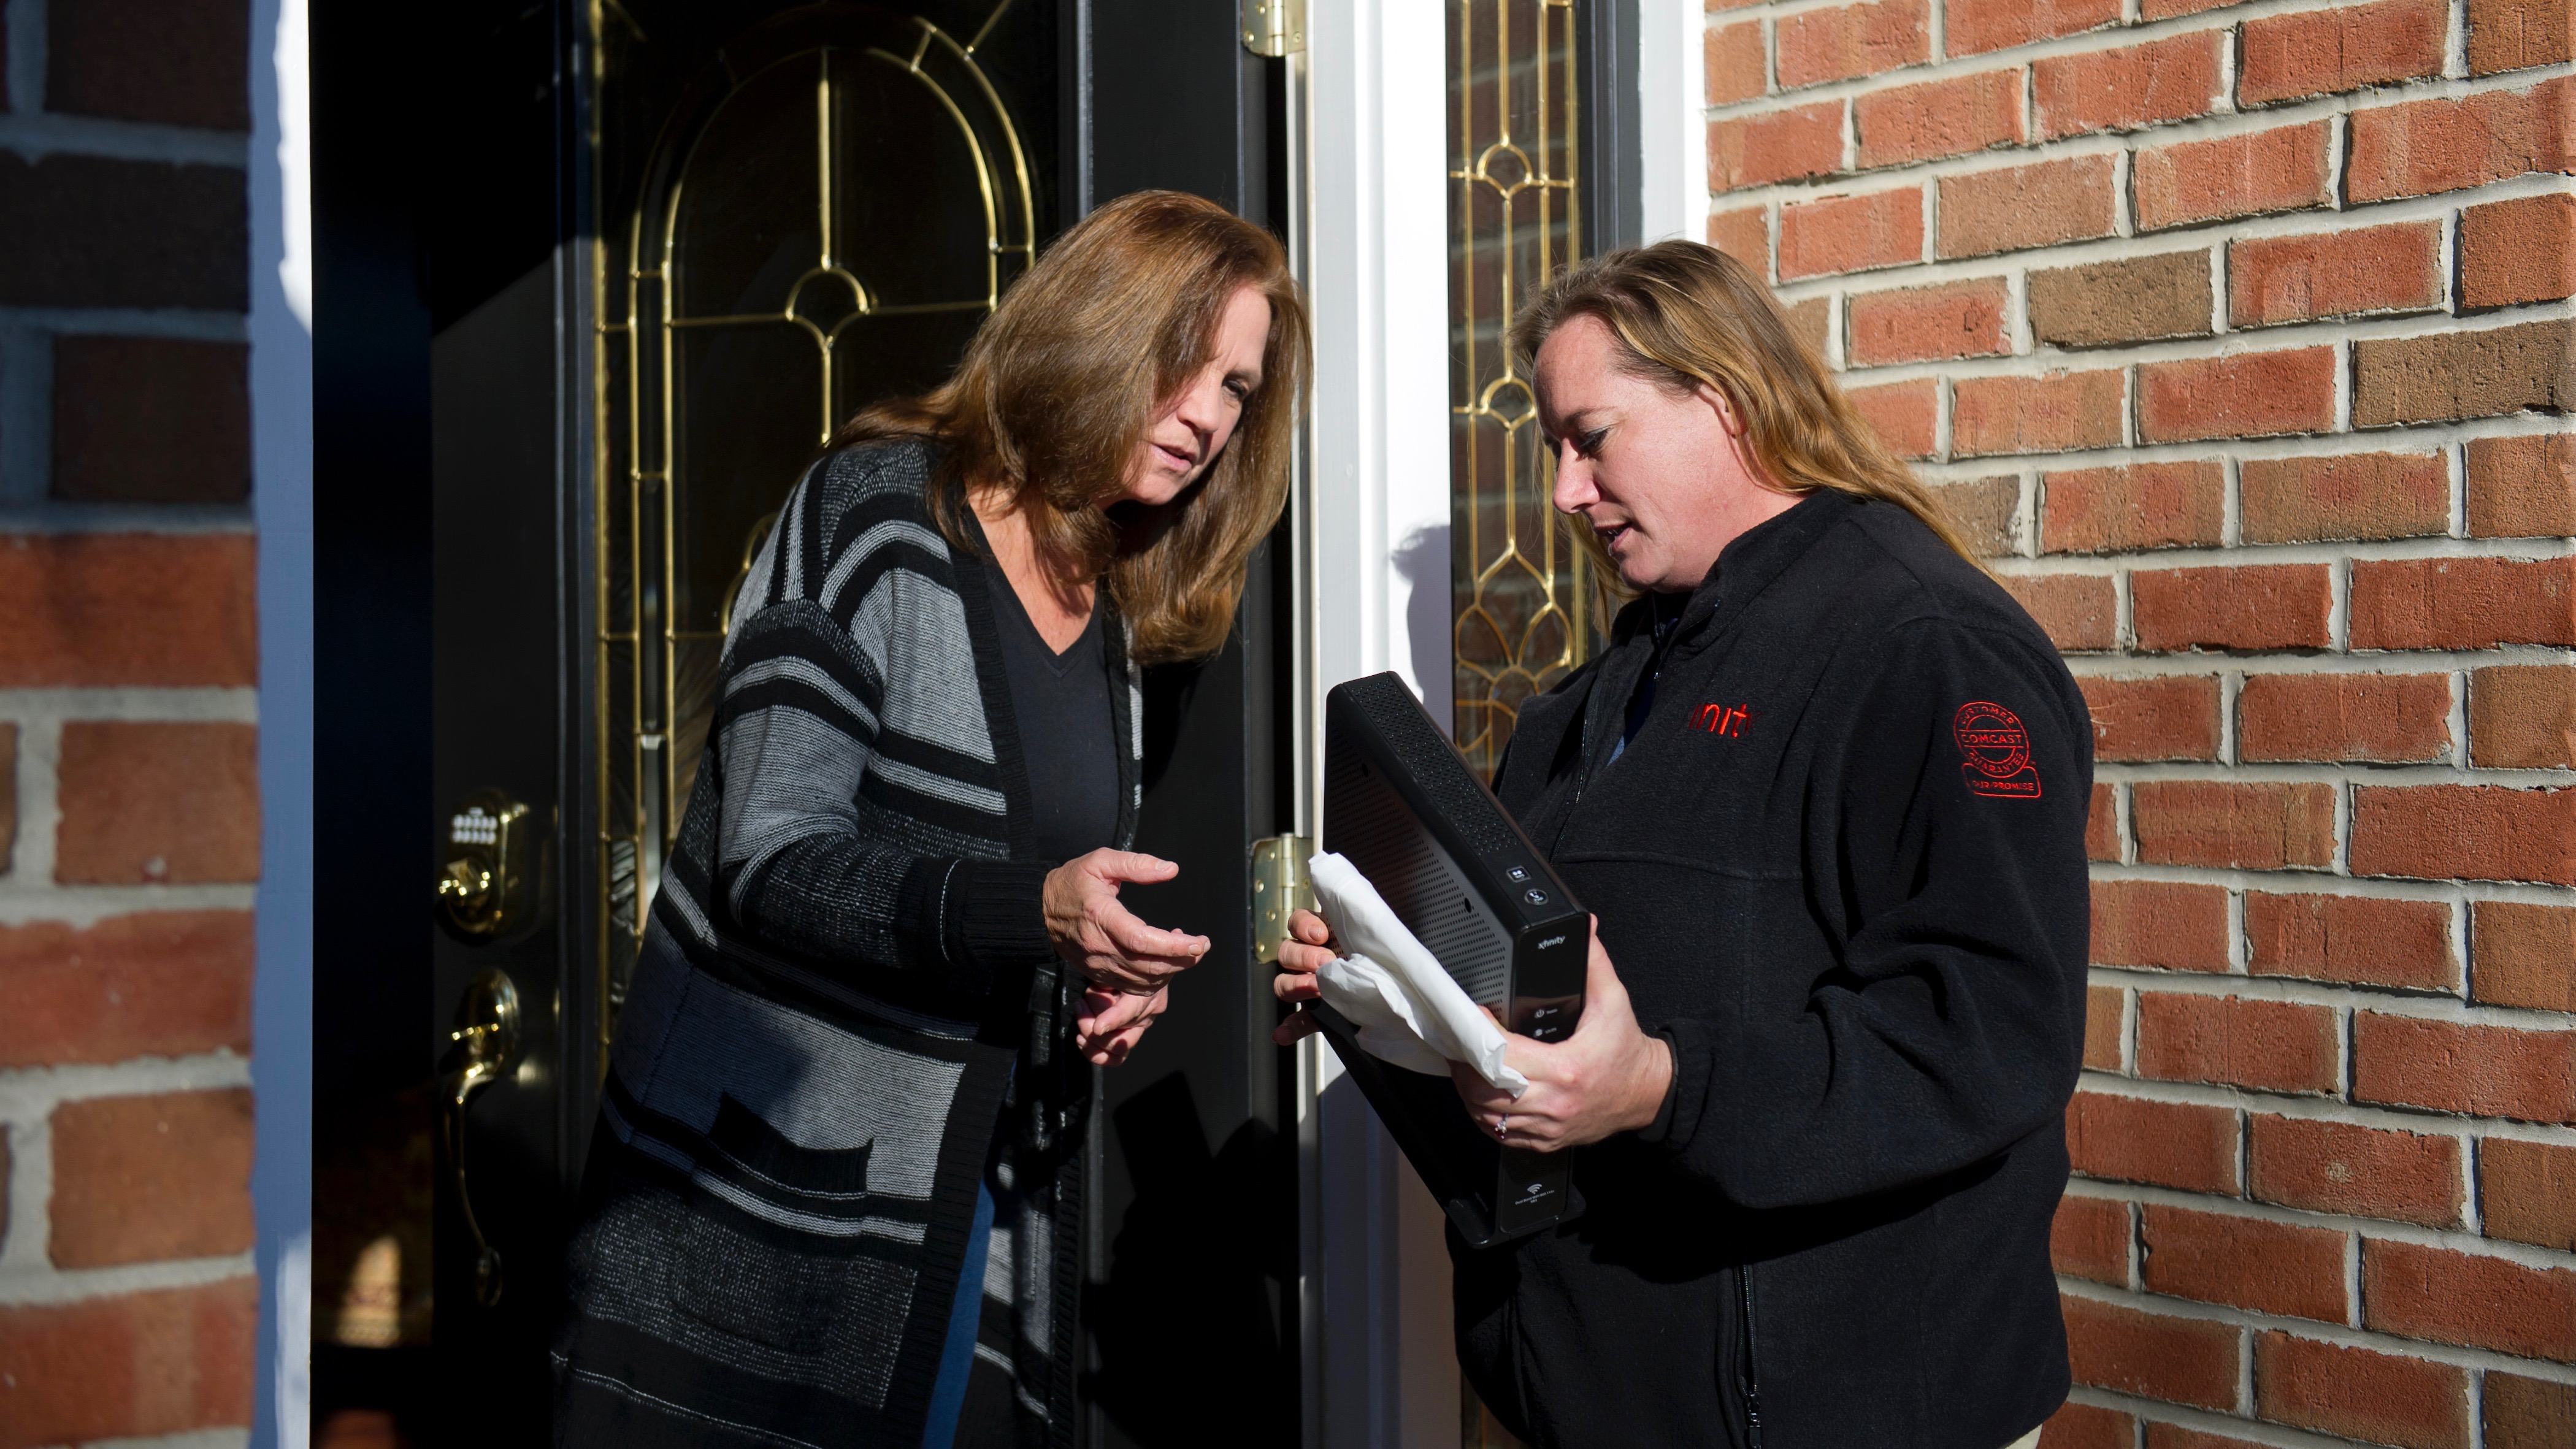 An Xfinity technician speaks with a customer in their doorway.